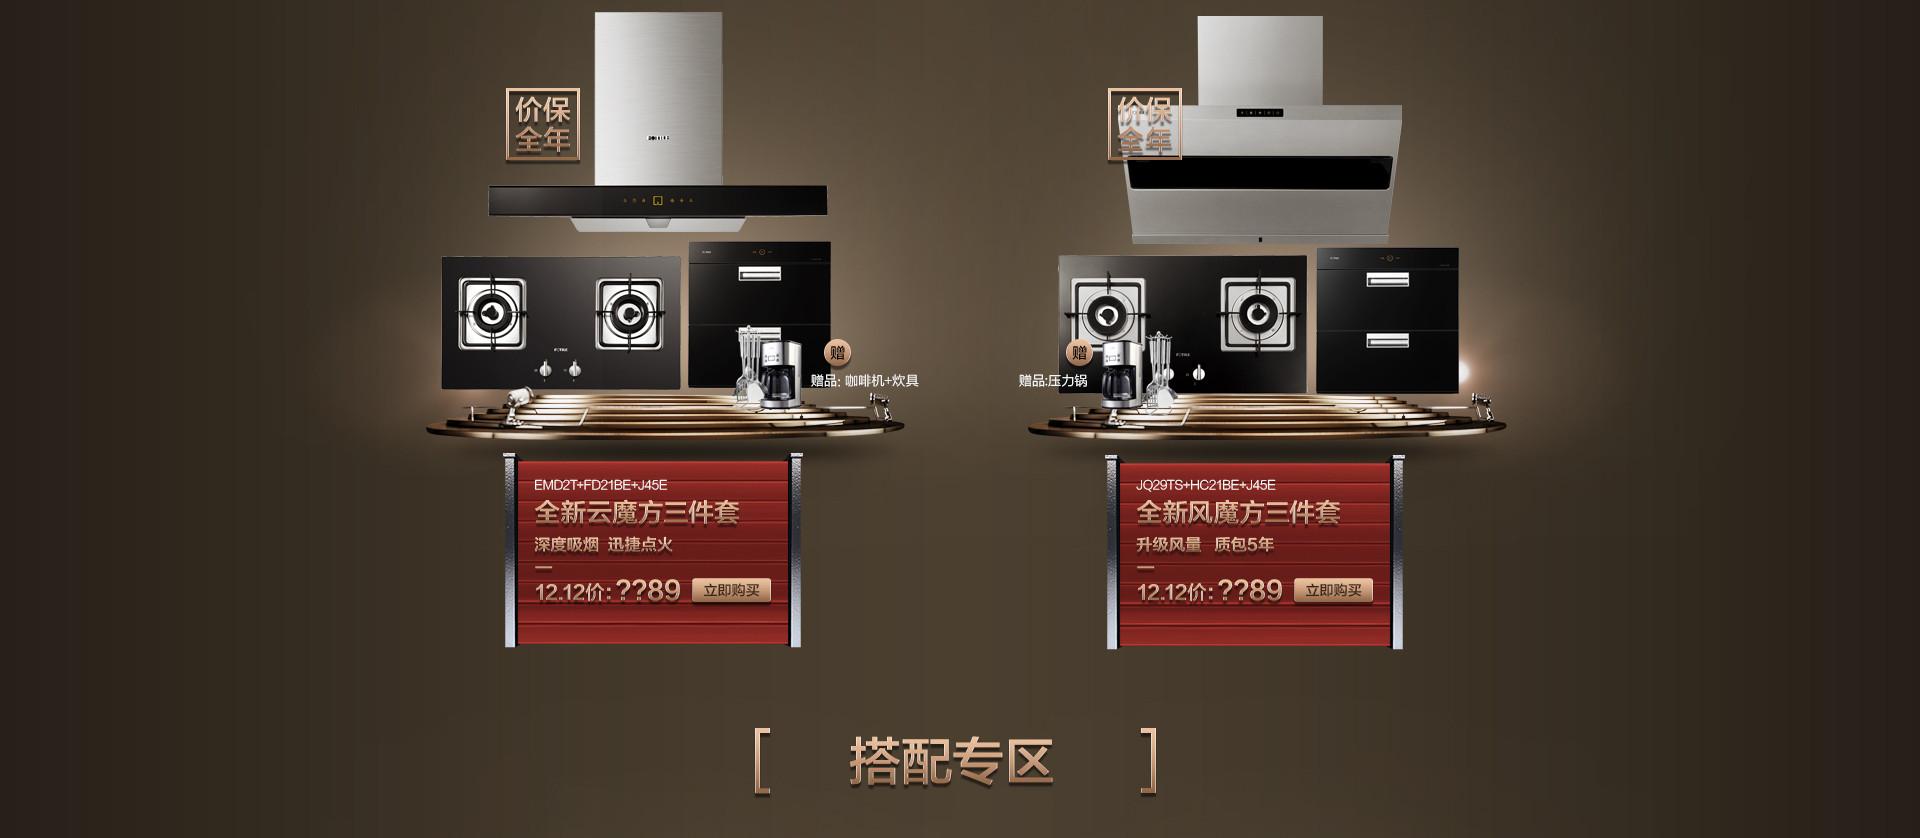 http://image.suning.cn/uimg/sop/commodity/190369539157033922648770_x.jpg